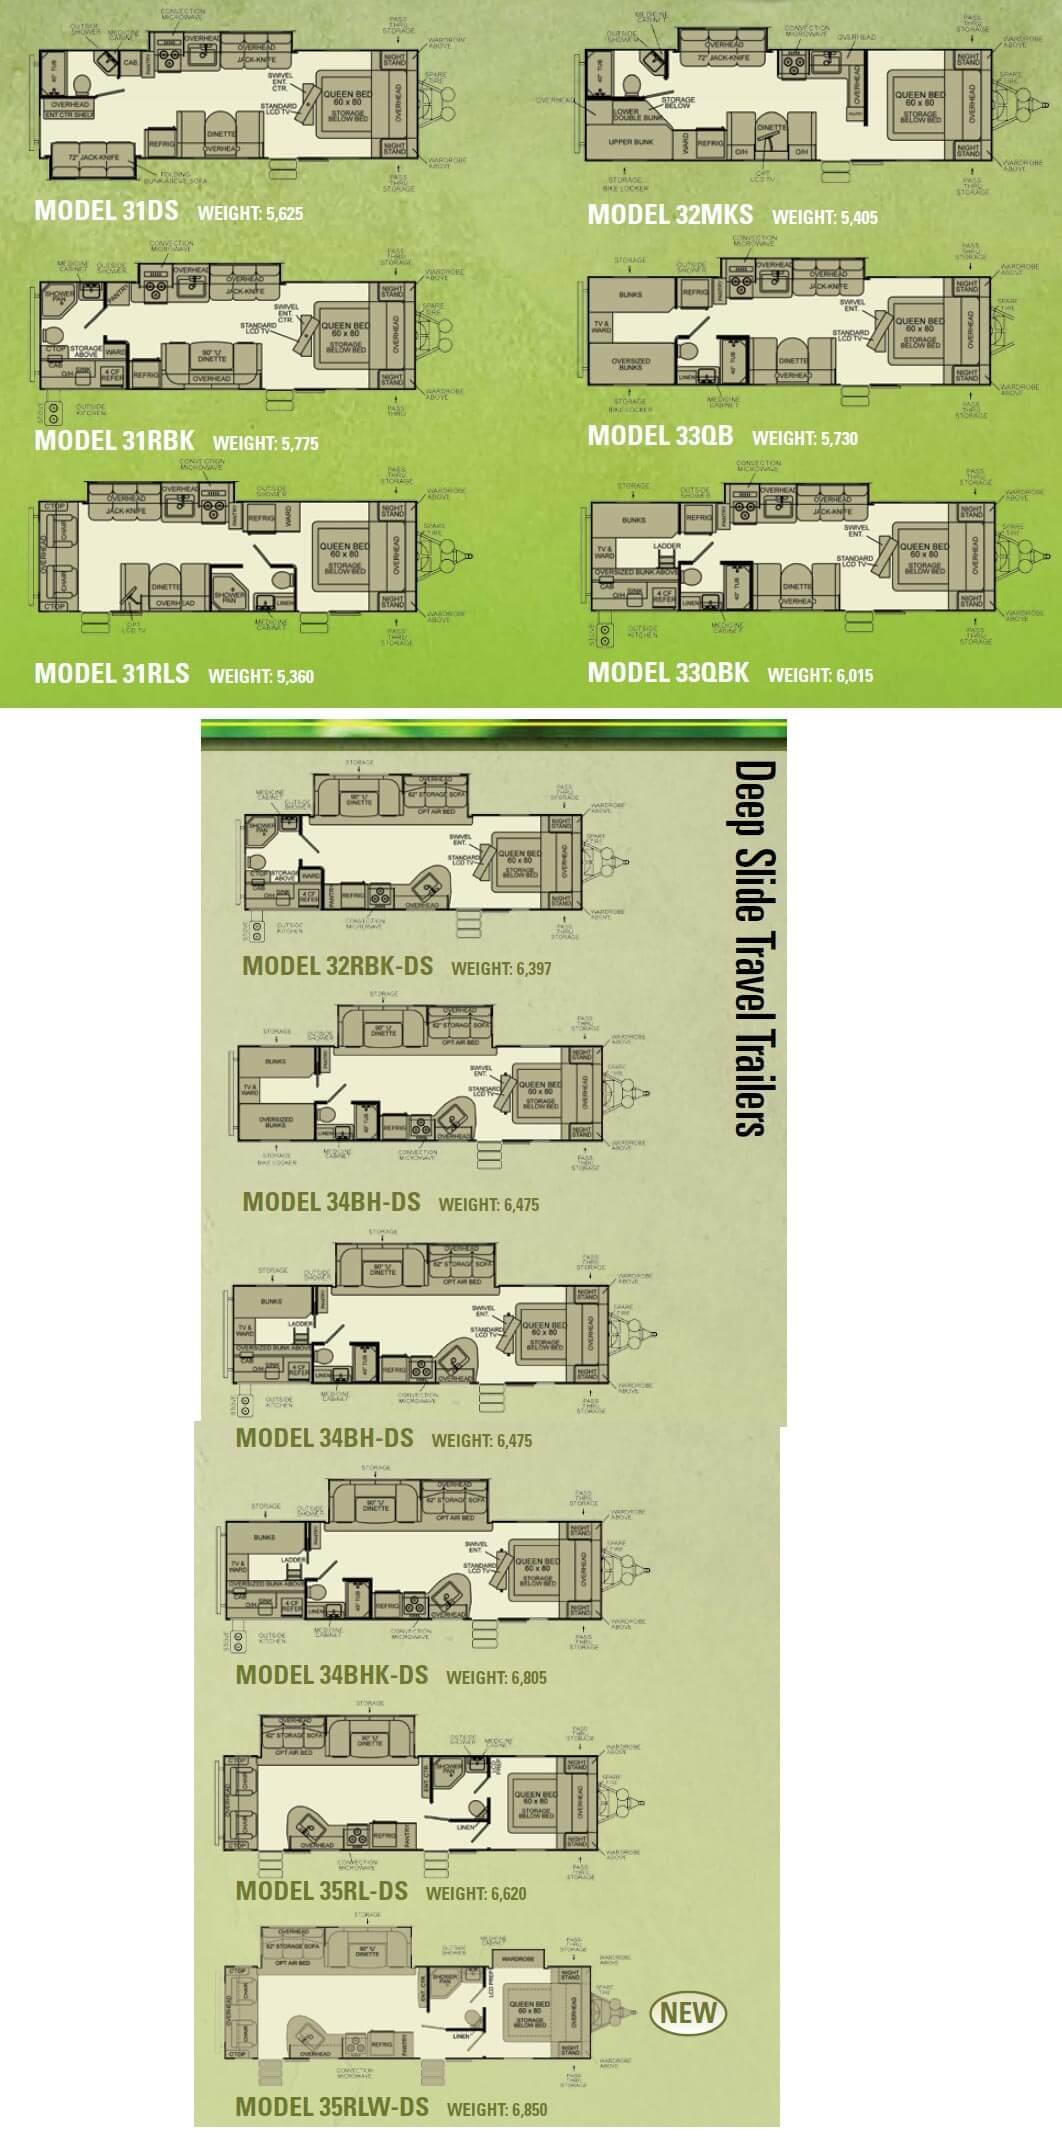 Evergreen Rv Floor Plans Evergreen Travel Trailer Floor Plans Gurus Floor